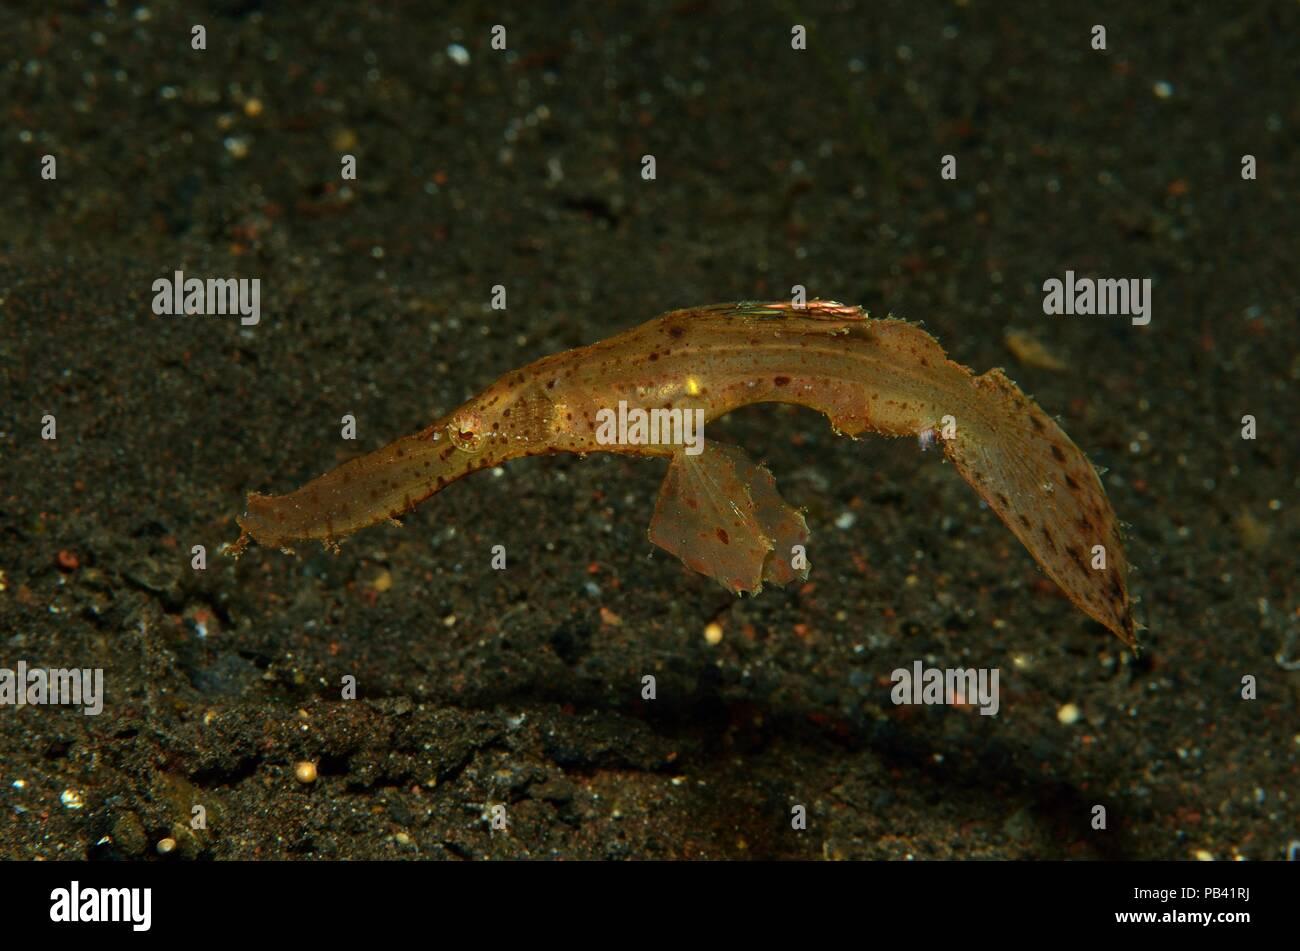 Seegras-Geisterpfeifenfisch, robust ghost pipefish, Solenostomus cyanopterus, Tulamben, Bali, Southeast Asia, Südostasien - Stock Image